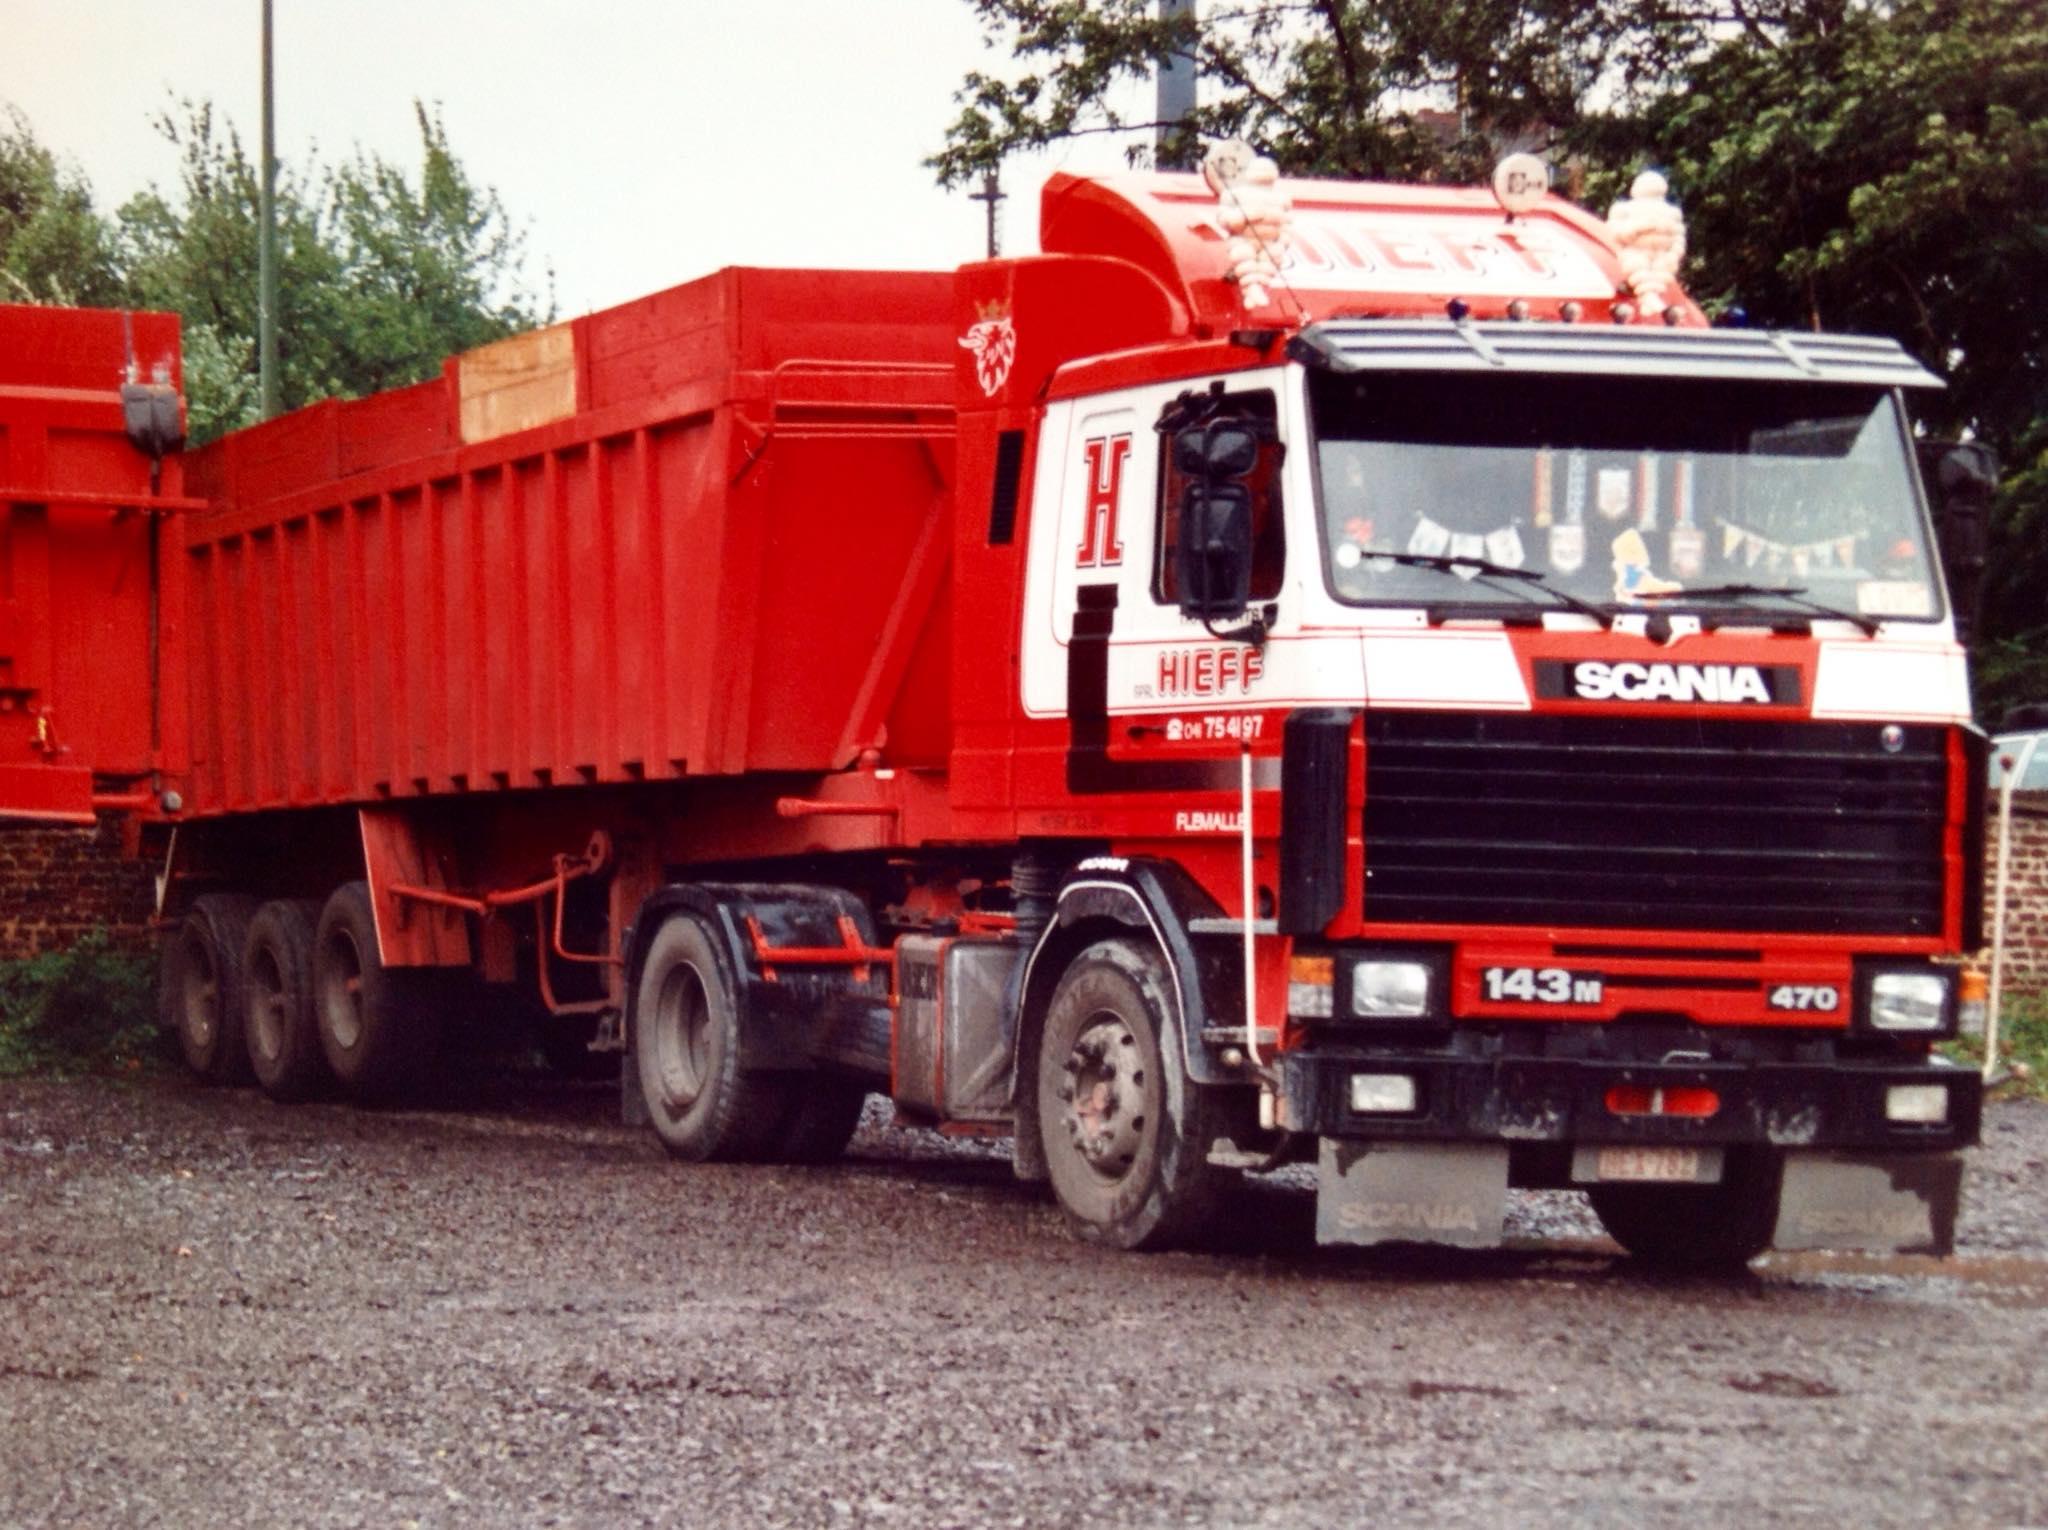 Scania-143m-470